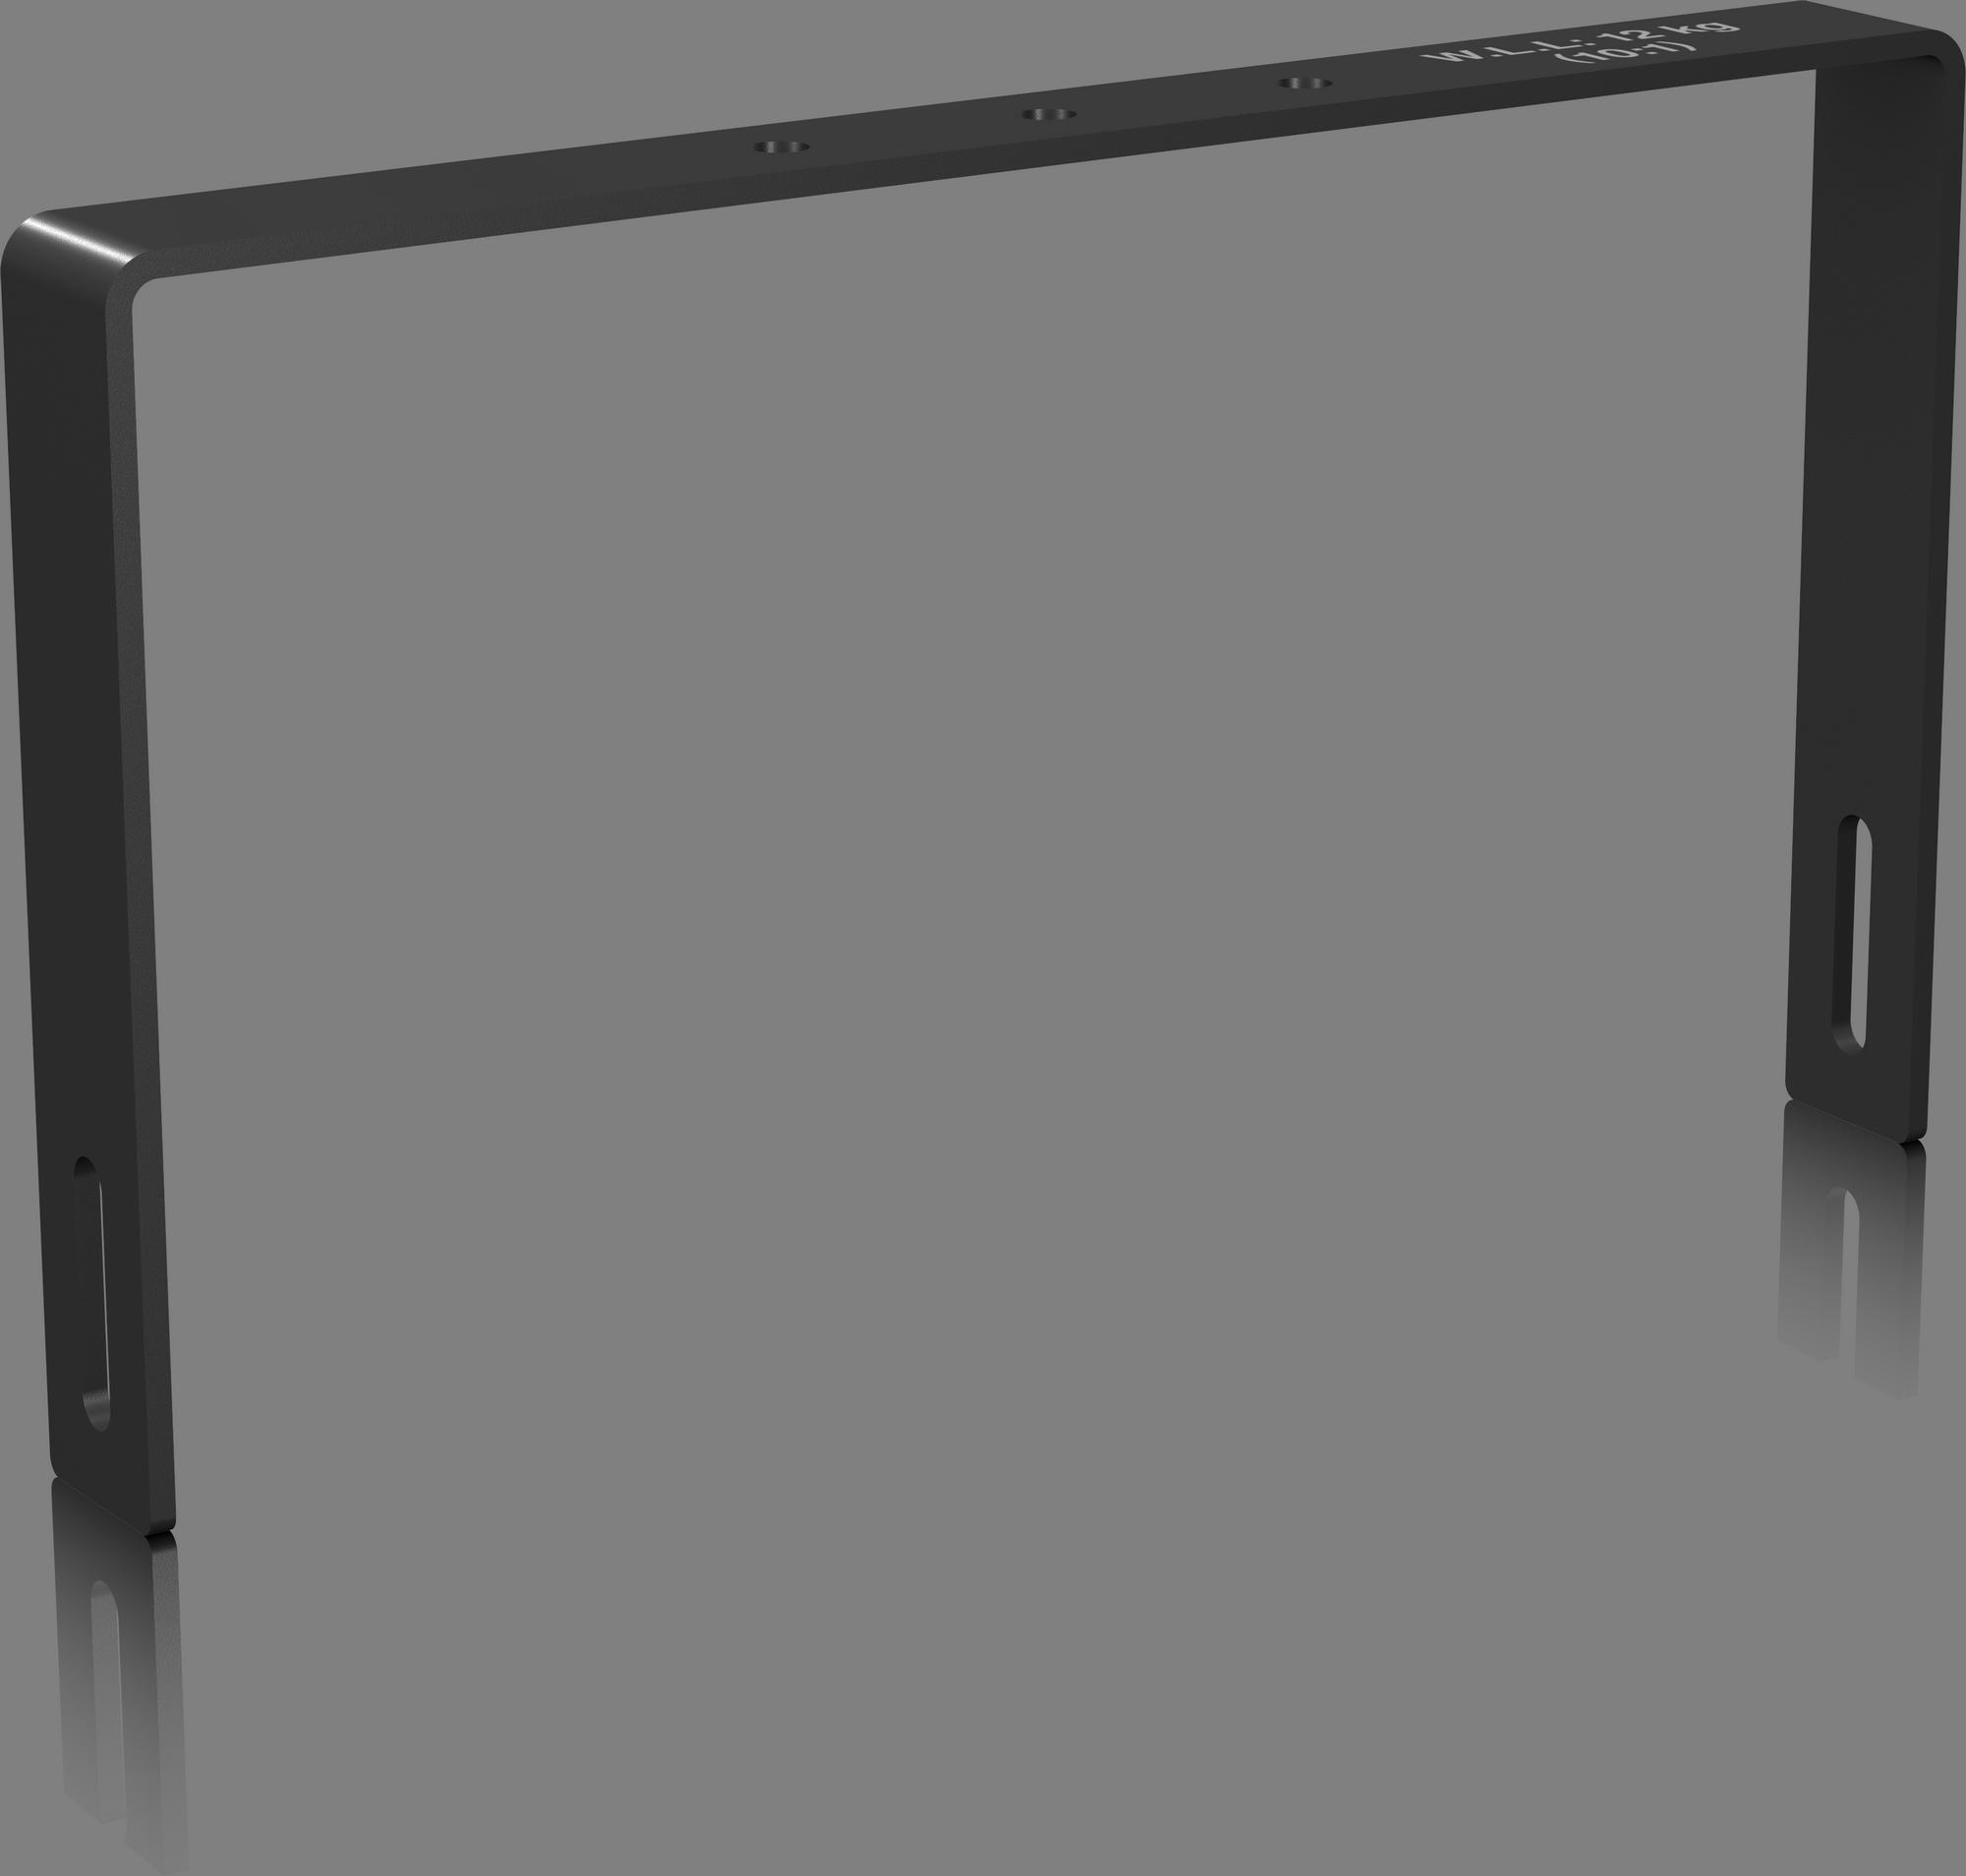 Tannoy  YOKE HORIZONTAL VX 8 - Wall Bracket